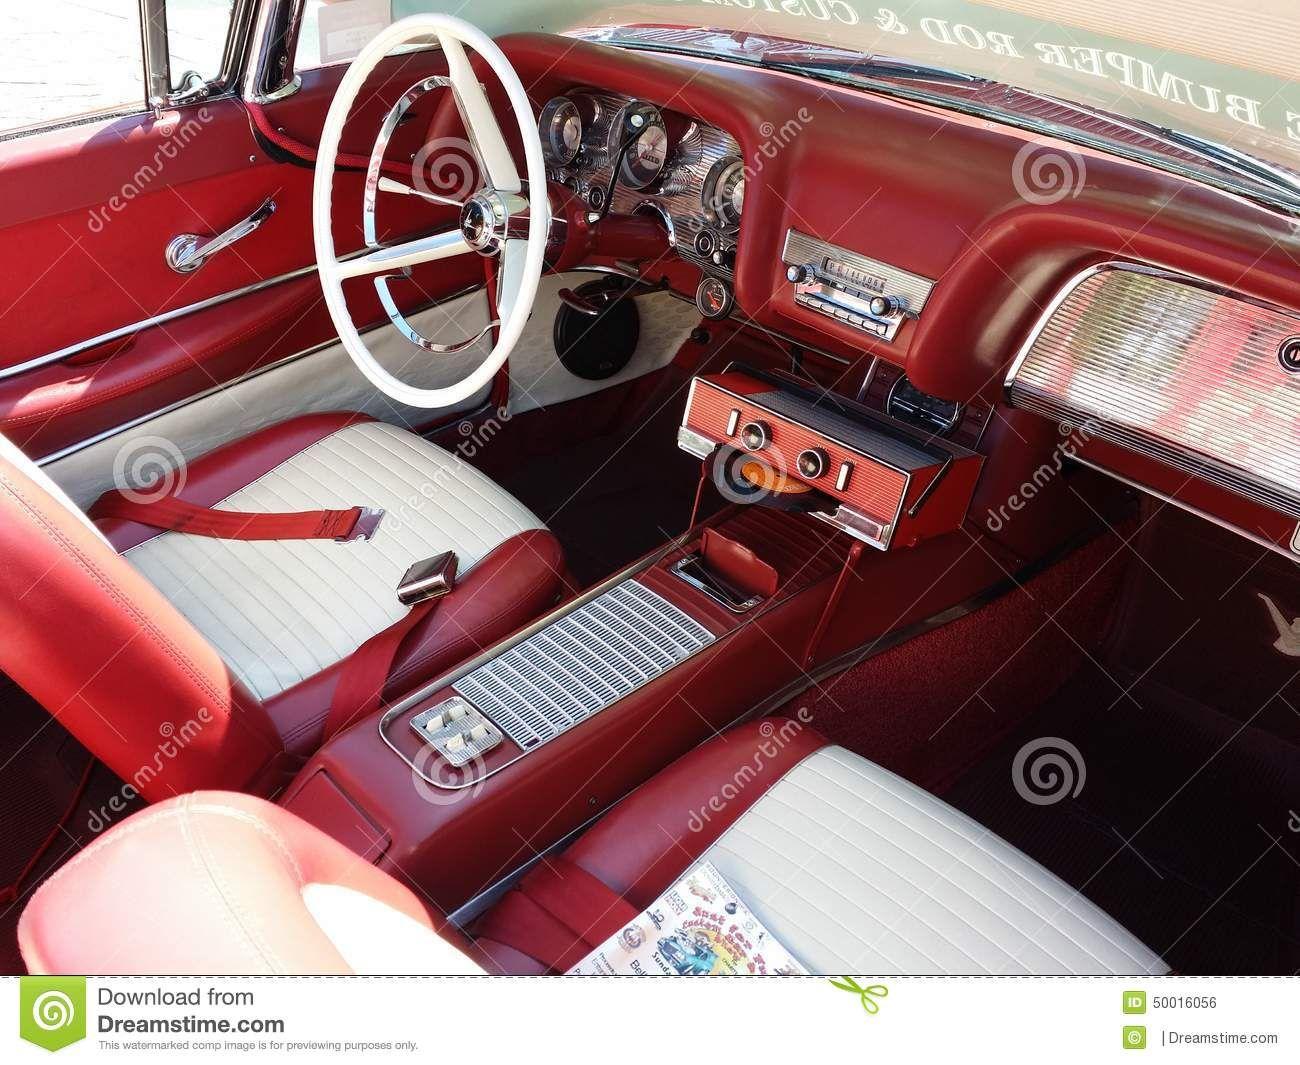 beautiful vintage car interiors - Google Search   Getaways ...